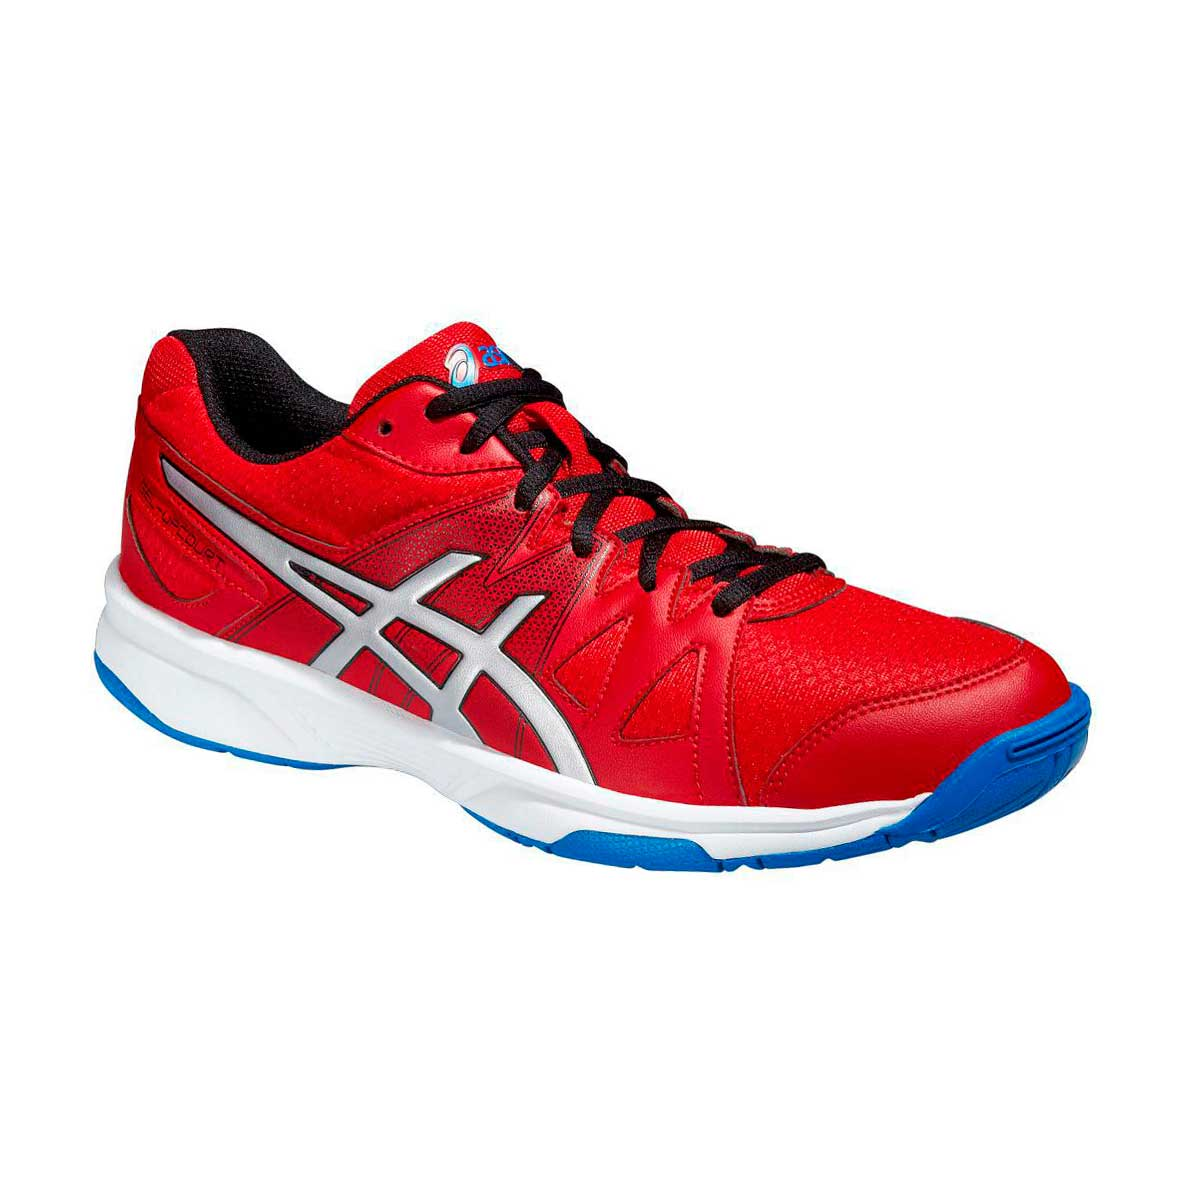 asics running shoes men blue